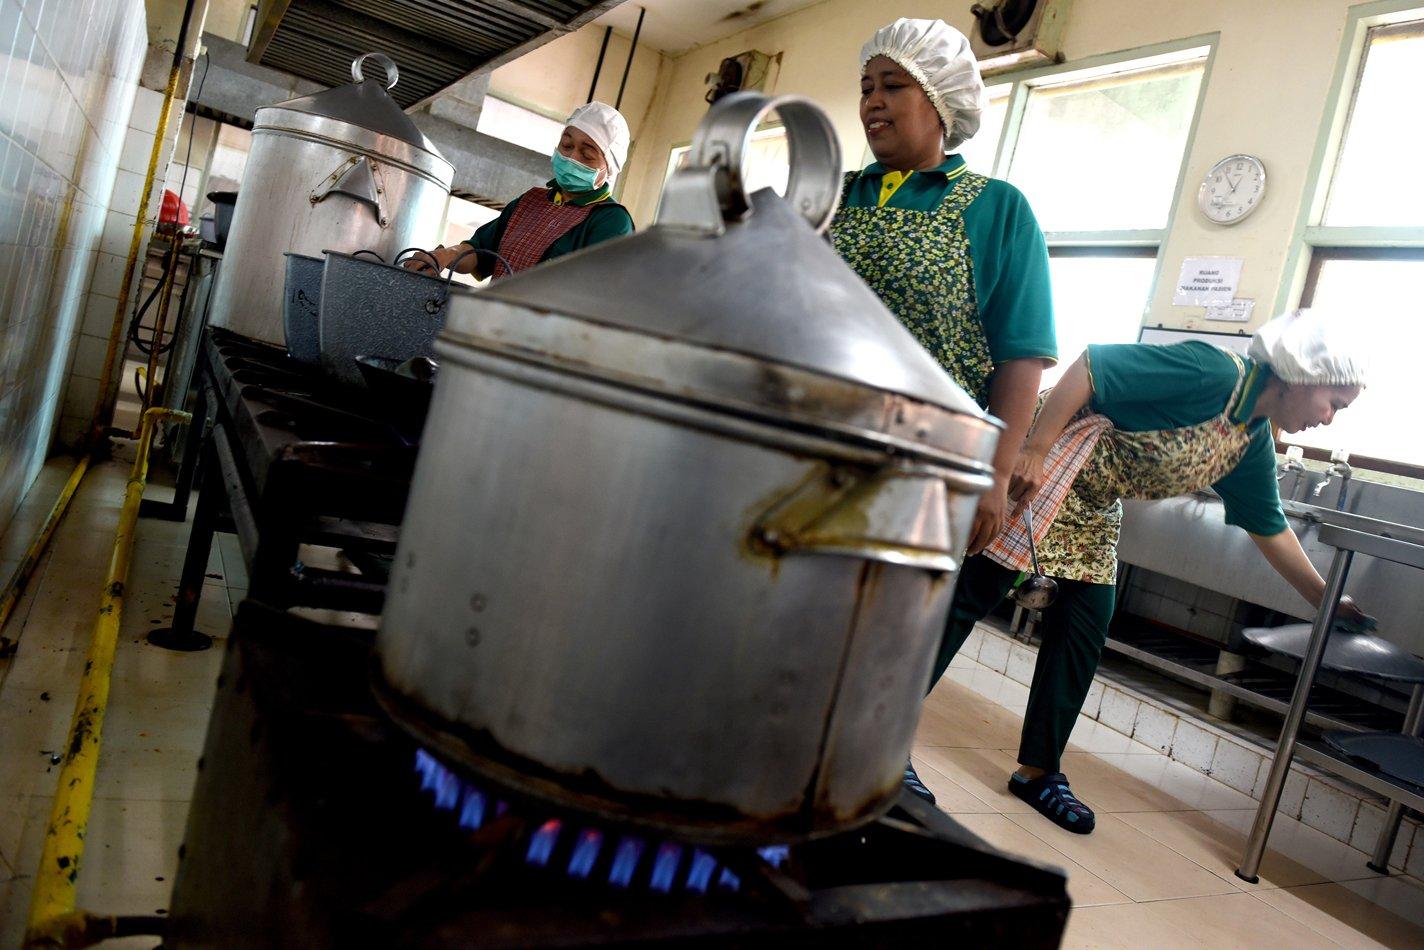 Pekerja memasak masakan pasien menggunakan gas PGN di dapur Rumah Sakit Darmo, Surabaya, Jawa Timur.